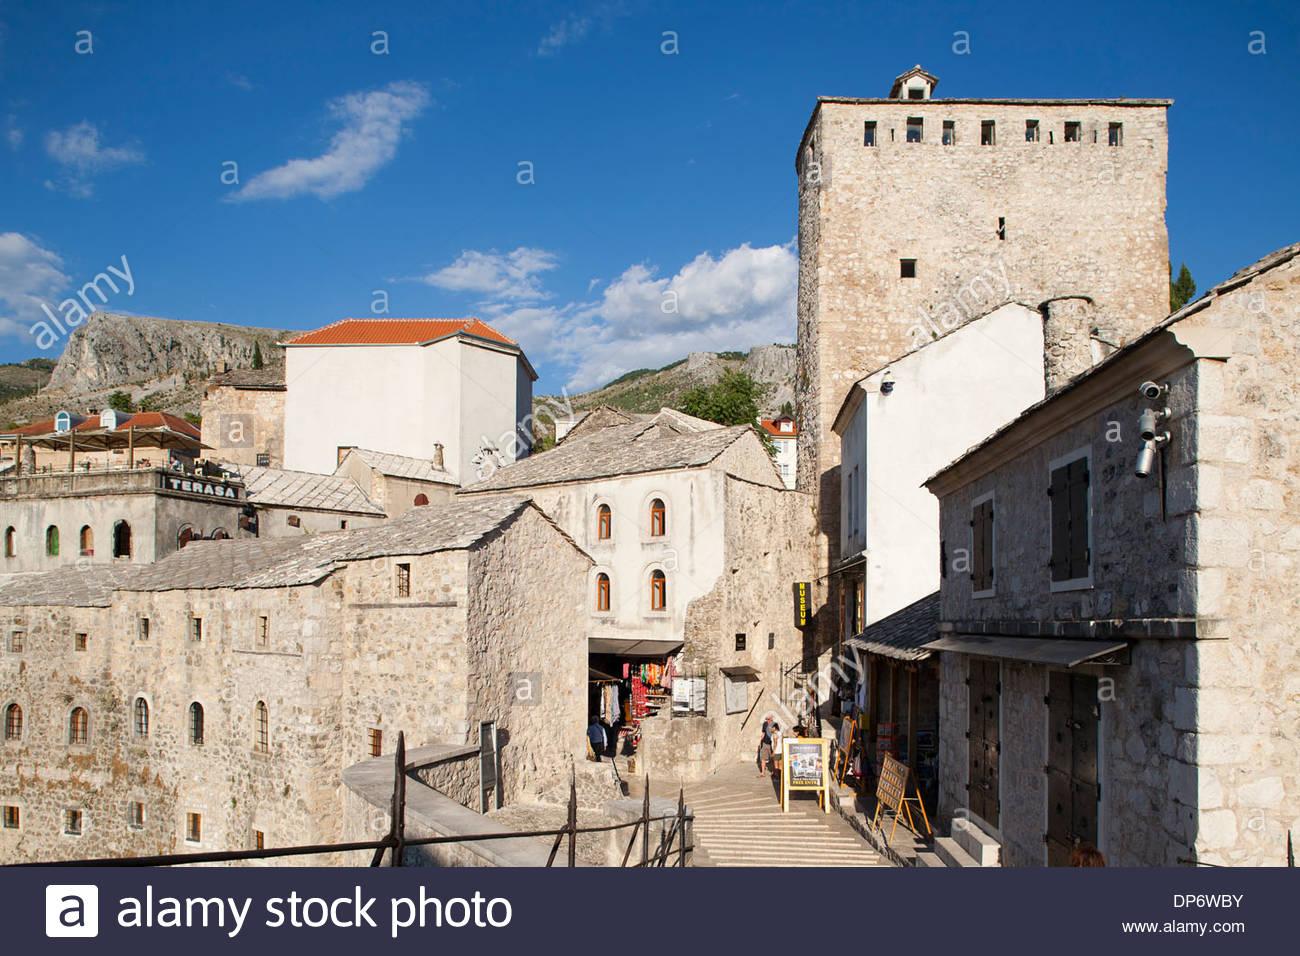 helabija tower and the old bridge,mostar,bosnia and herzegovina,europe - Stock Image